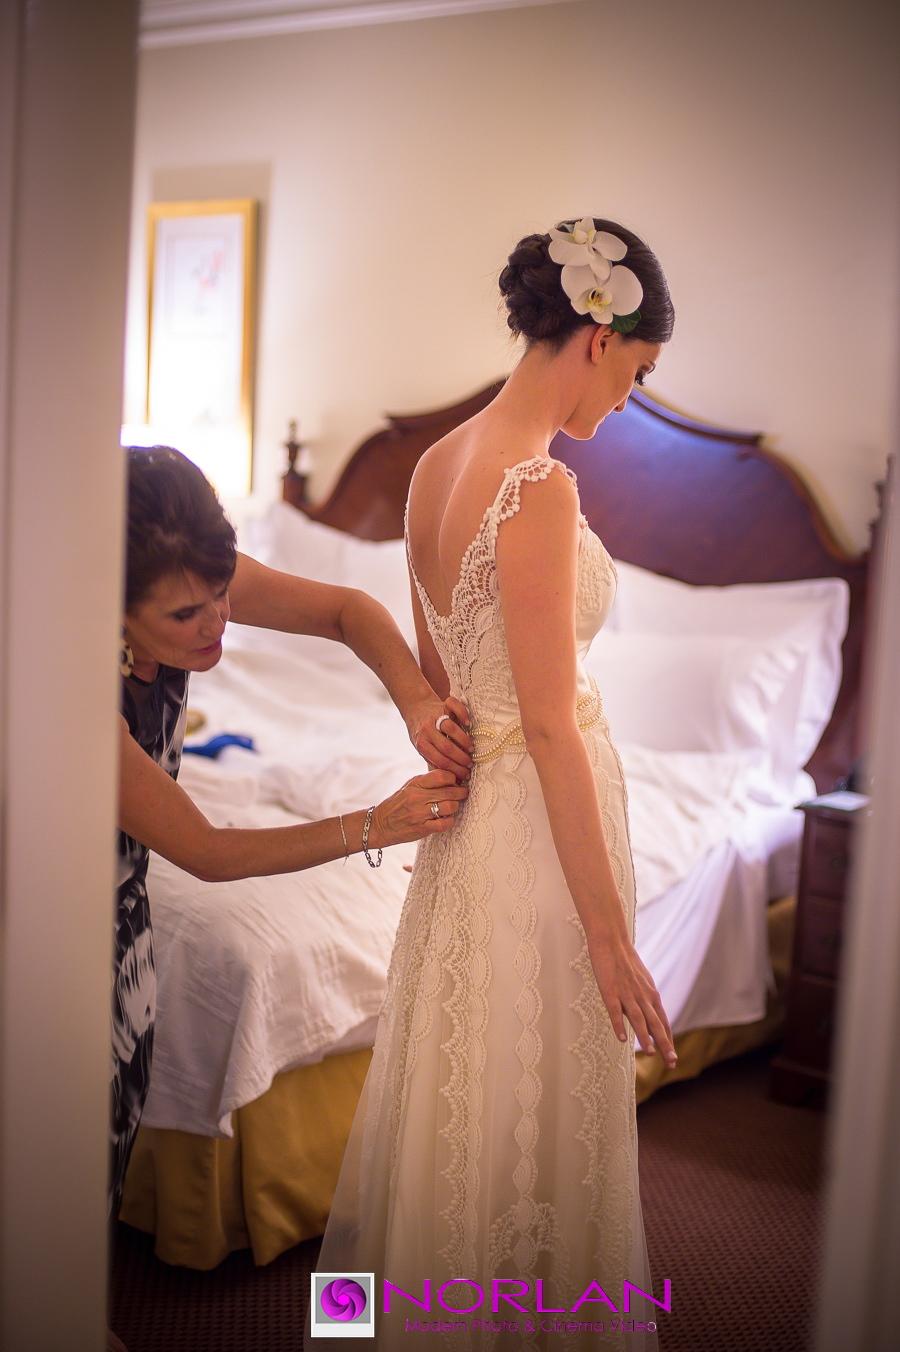 Fotos bodas-casamientos norlan-fotos de bodas en bs as- fotos de norlan estudio-fotos de moderm photo y cinema video-fotografias de bodas -fotos de novias_12